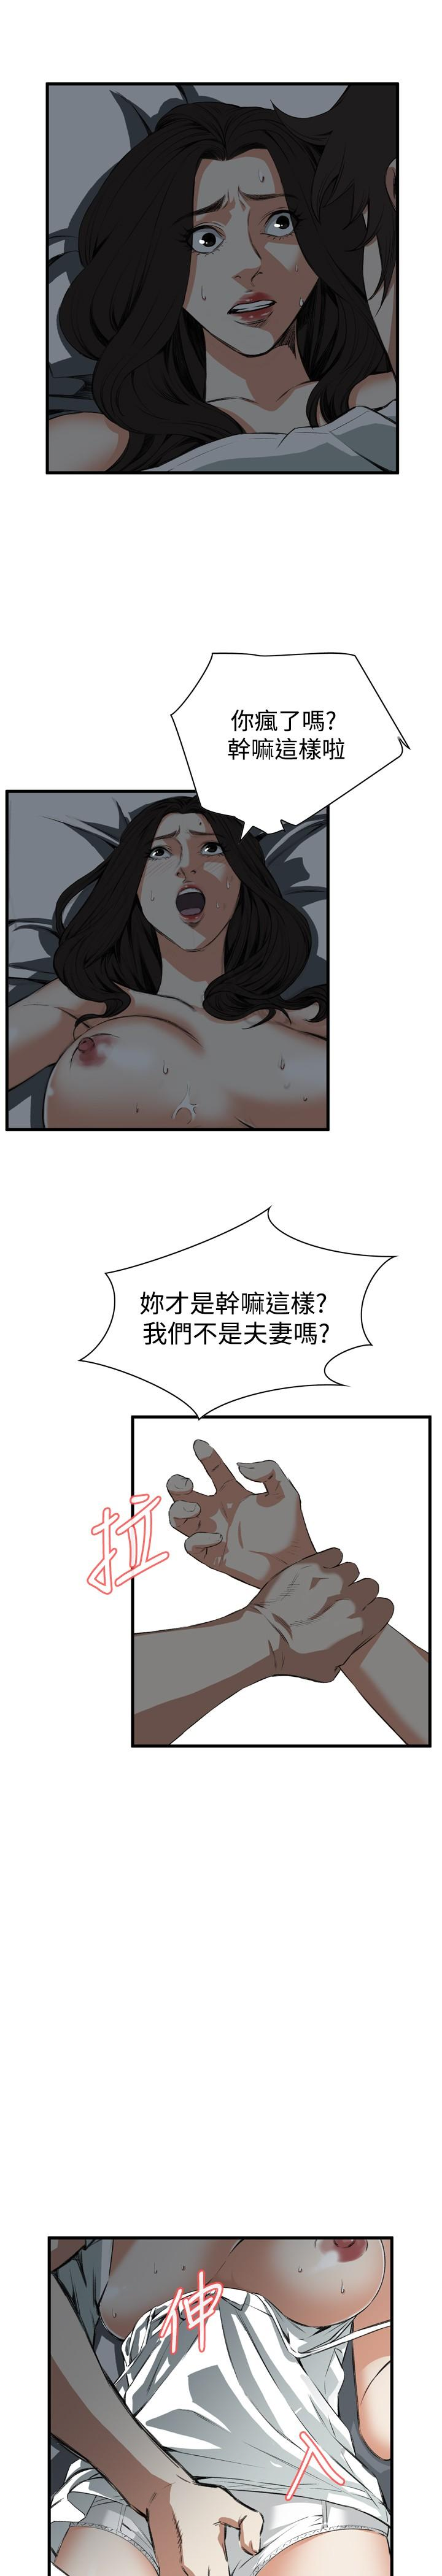 Take a Peek 偷窥 Ch.39~51 [Chinese]中文 196